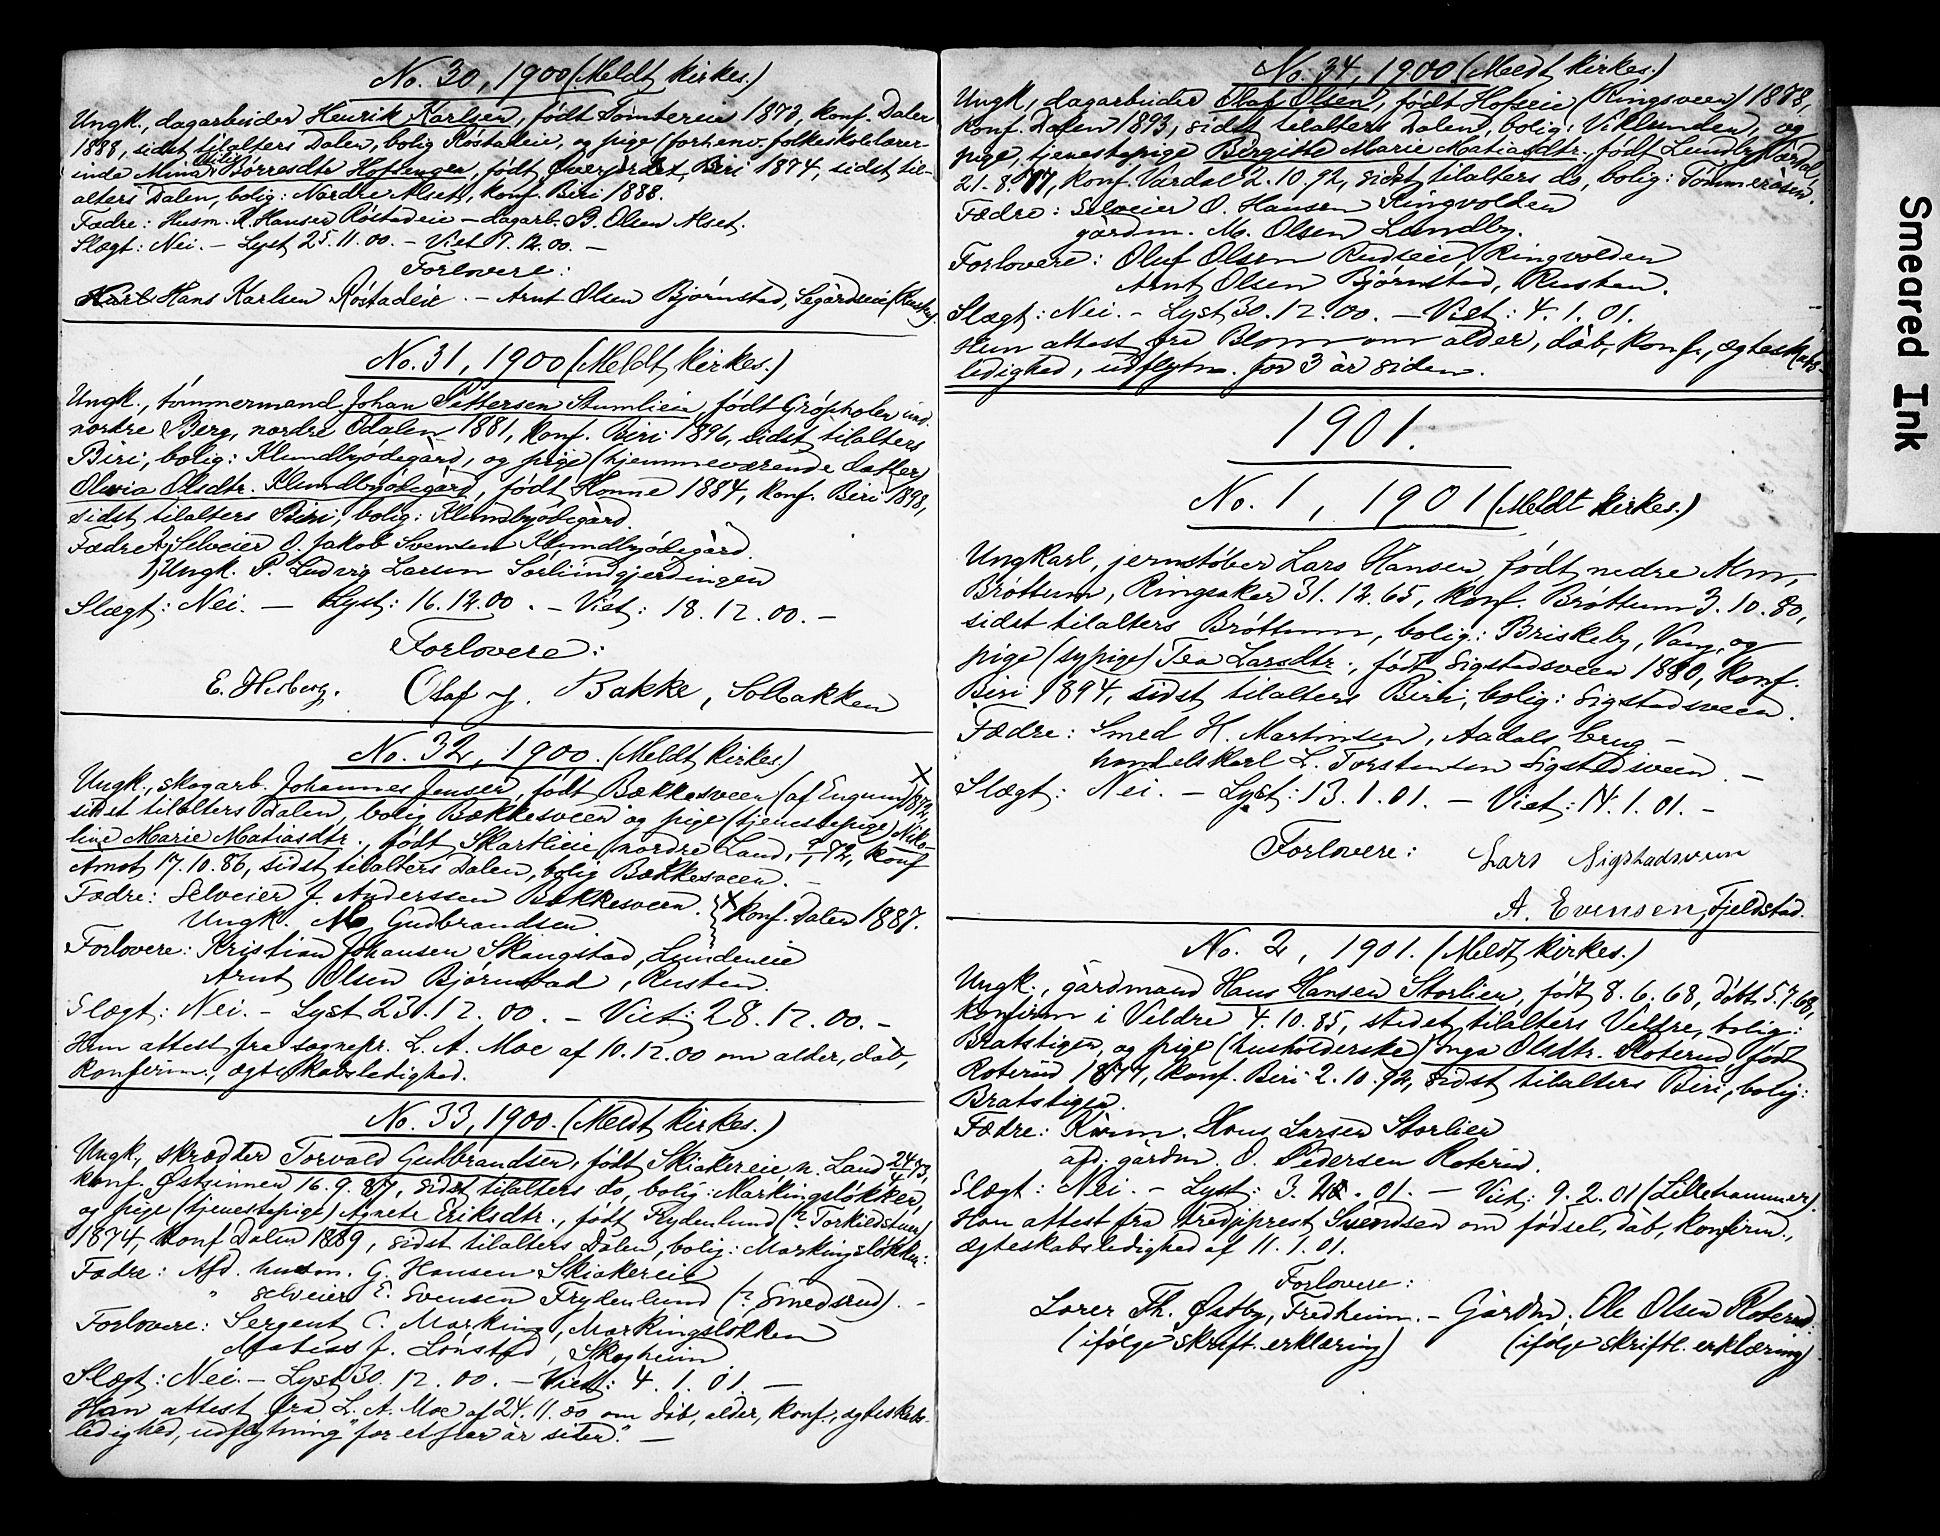 SAH, Biri prestekontor, I/Ie/Iea/L0001/0002: Banns register no. 1.2, 1900-1909